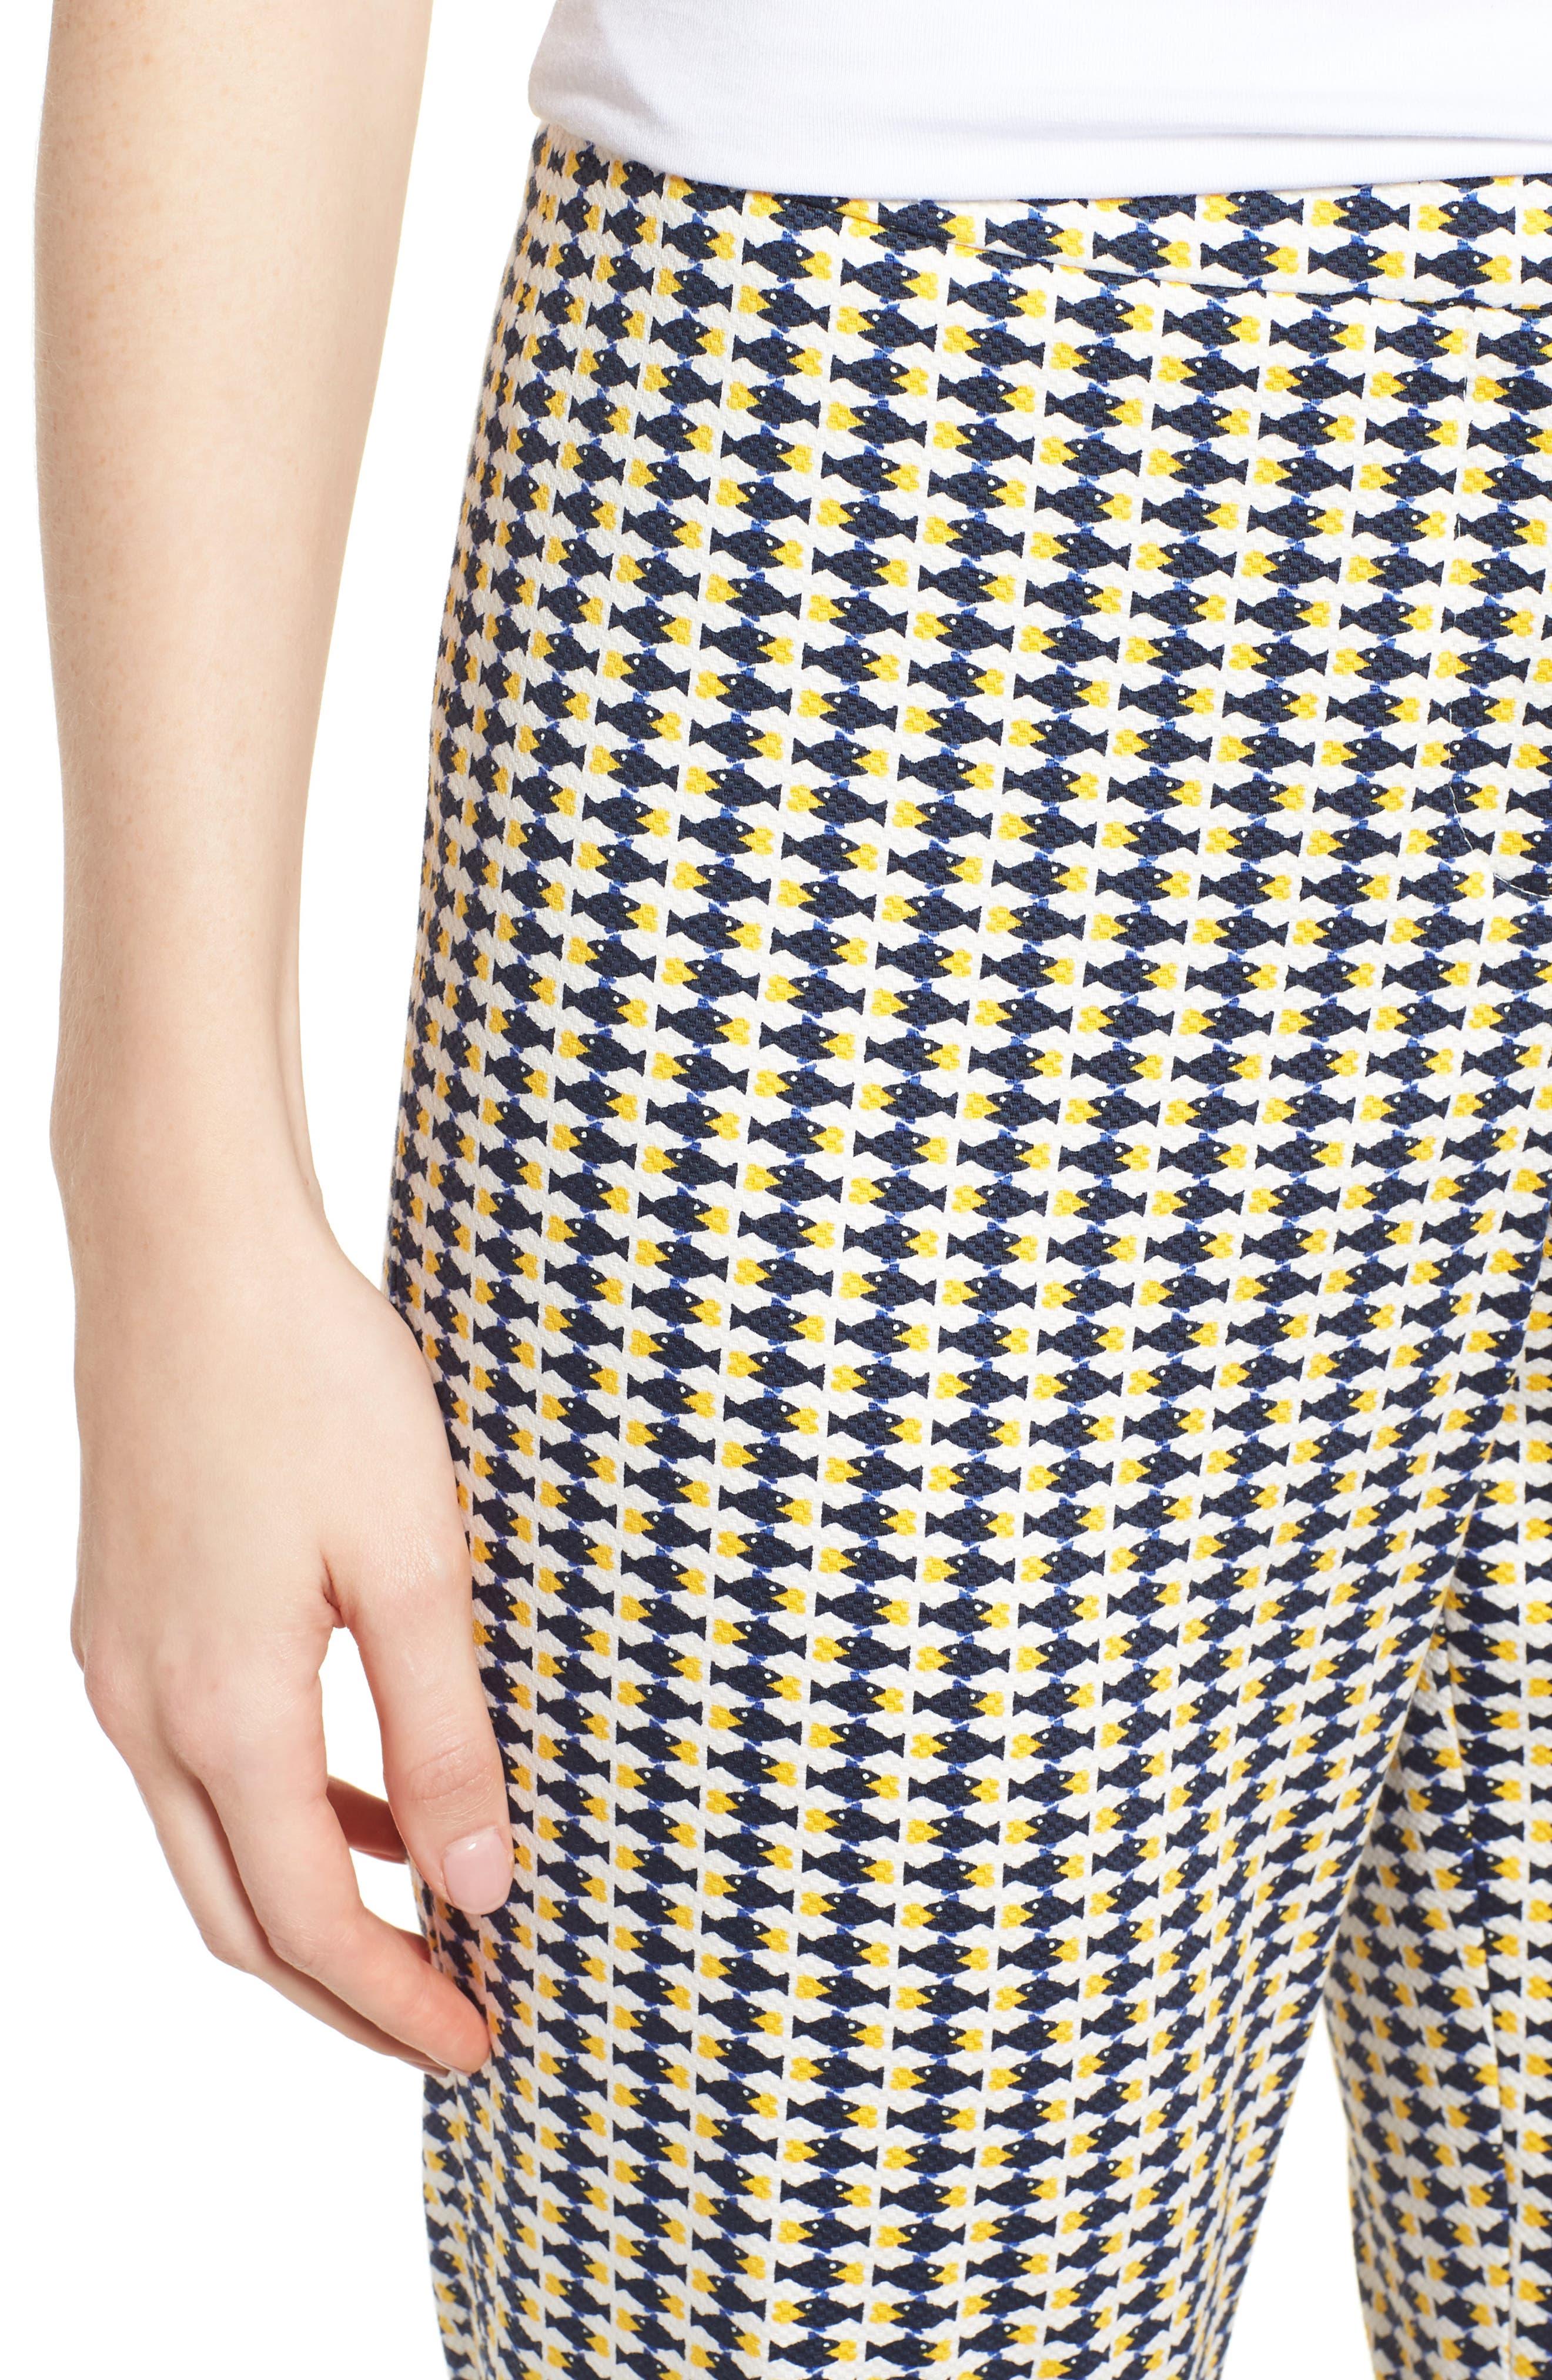 Tiluna6 Heartfish Slim Ankle Trousers,                             Alternate thumbnail 4, color,                             Heart Fishes